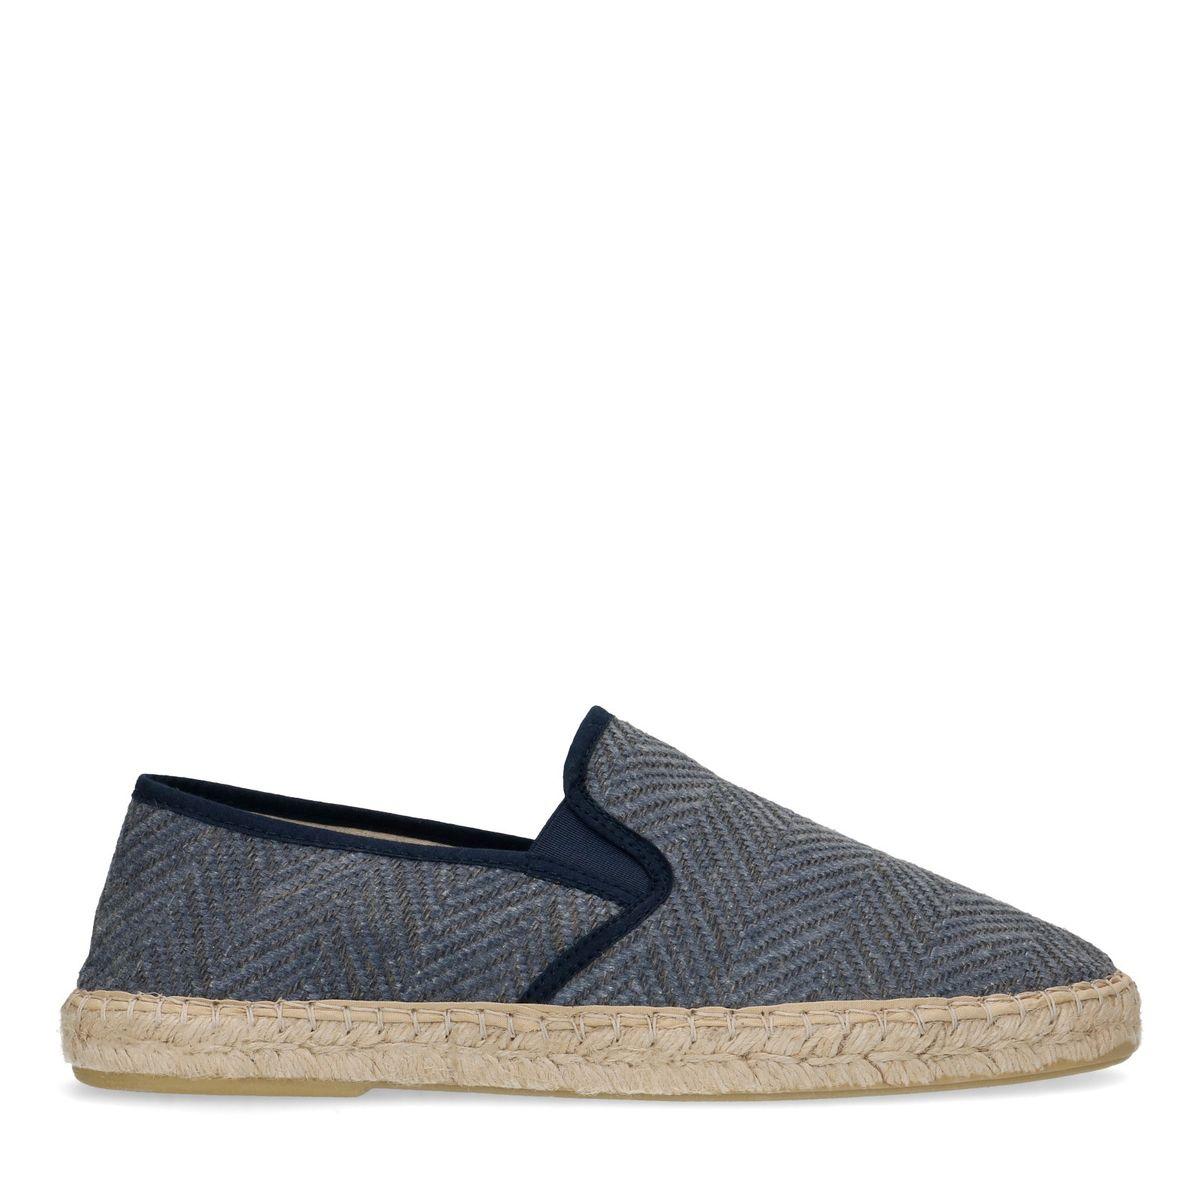 Slip-on textile - bleu (Maat 42)